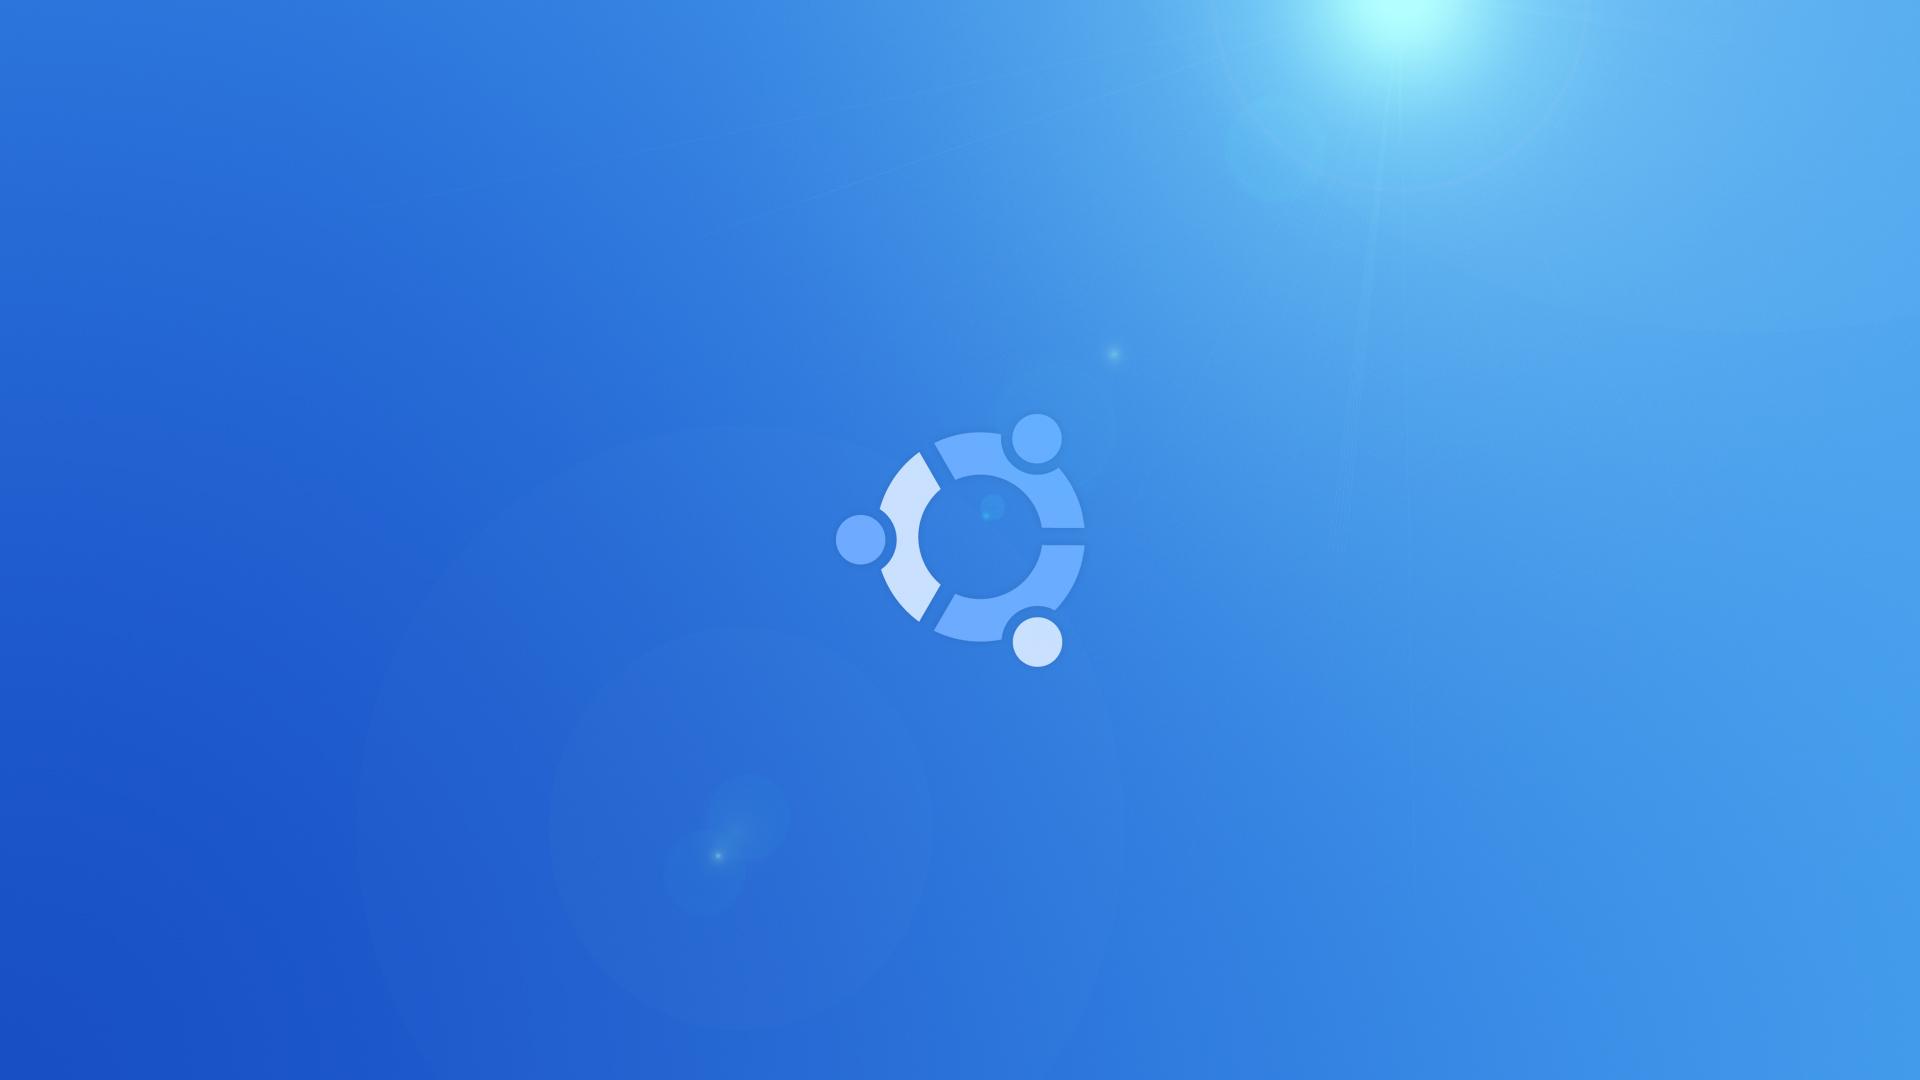 Best Ubuntu HD Wallpapers For Download